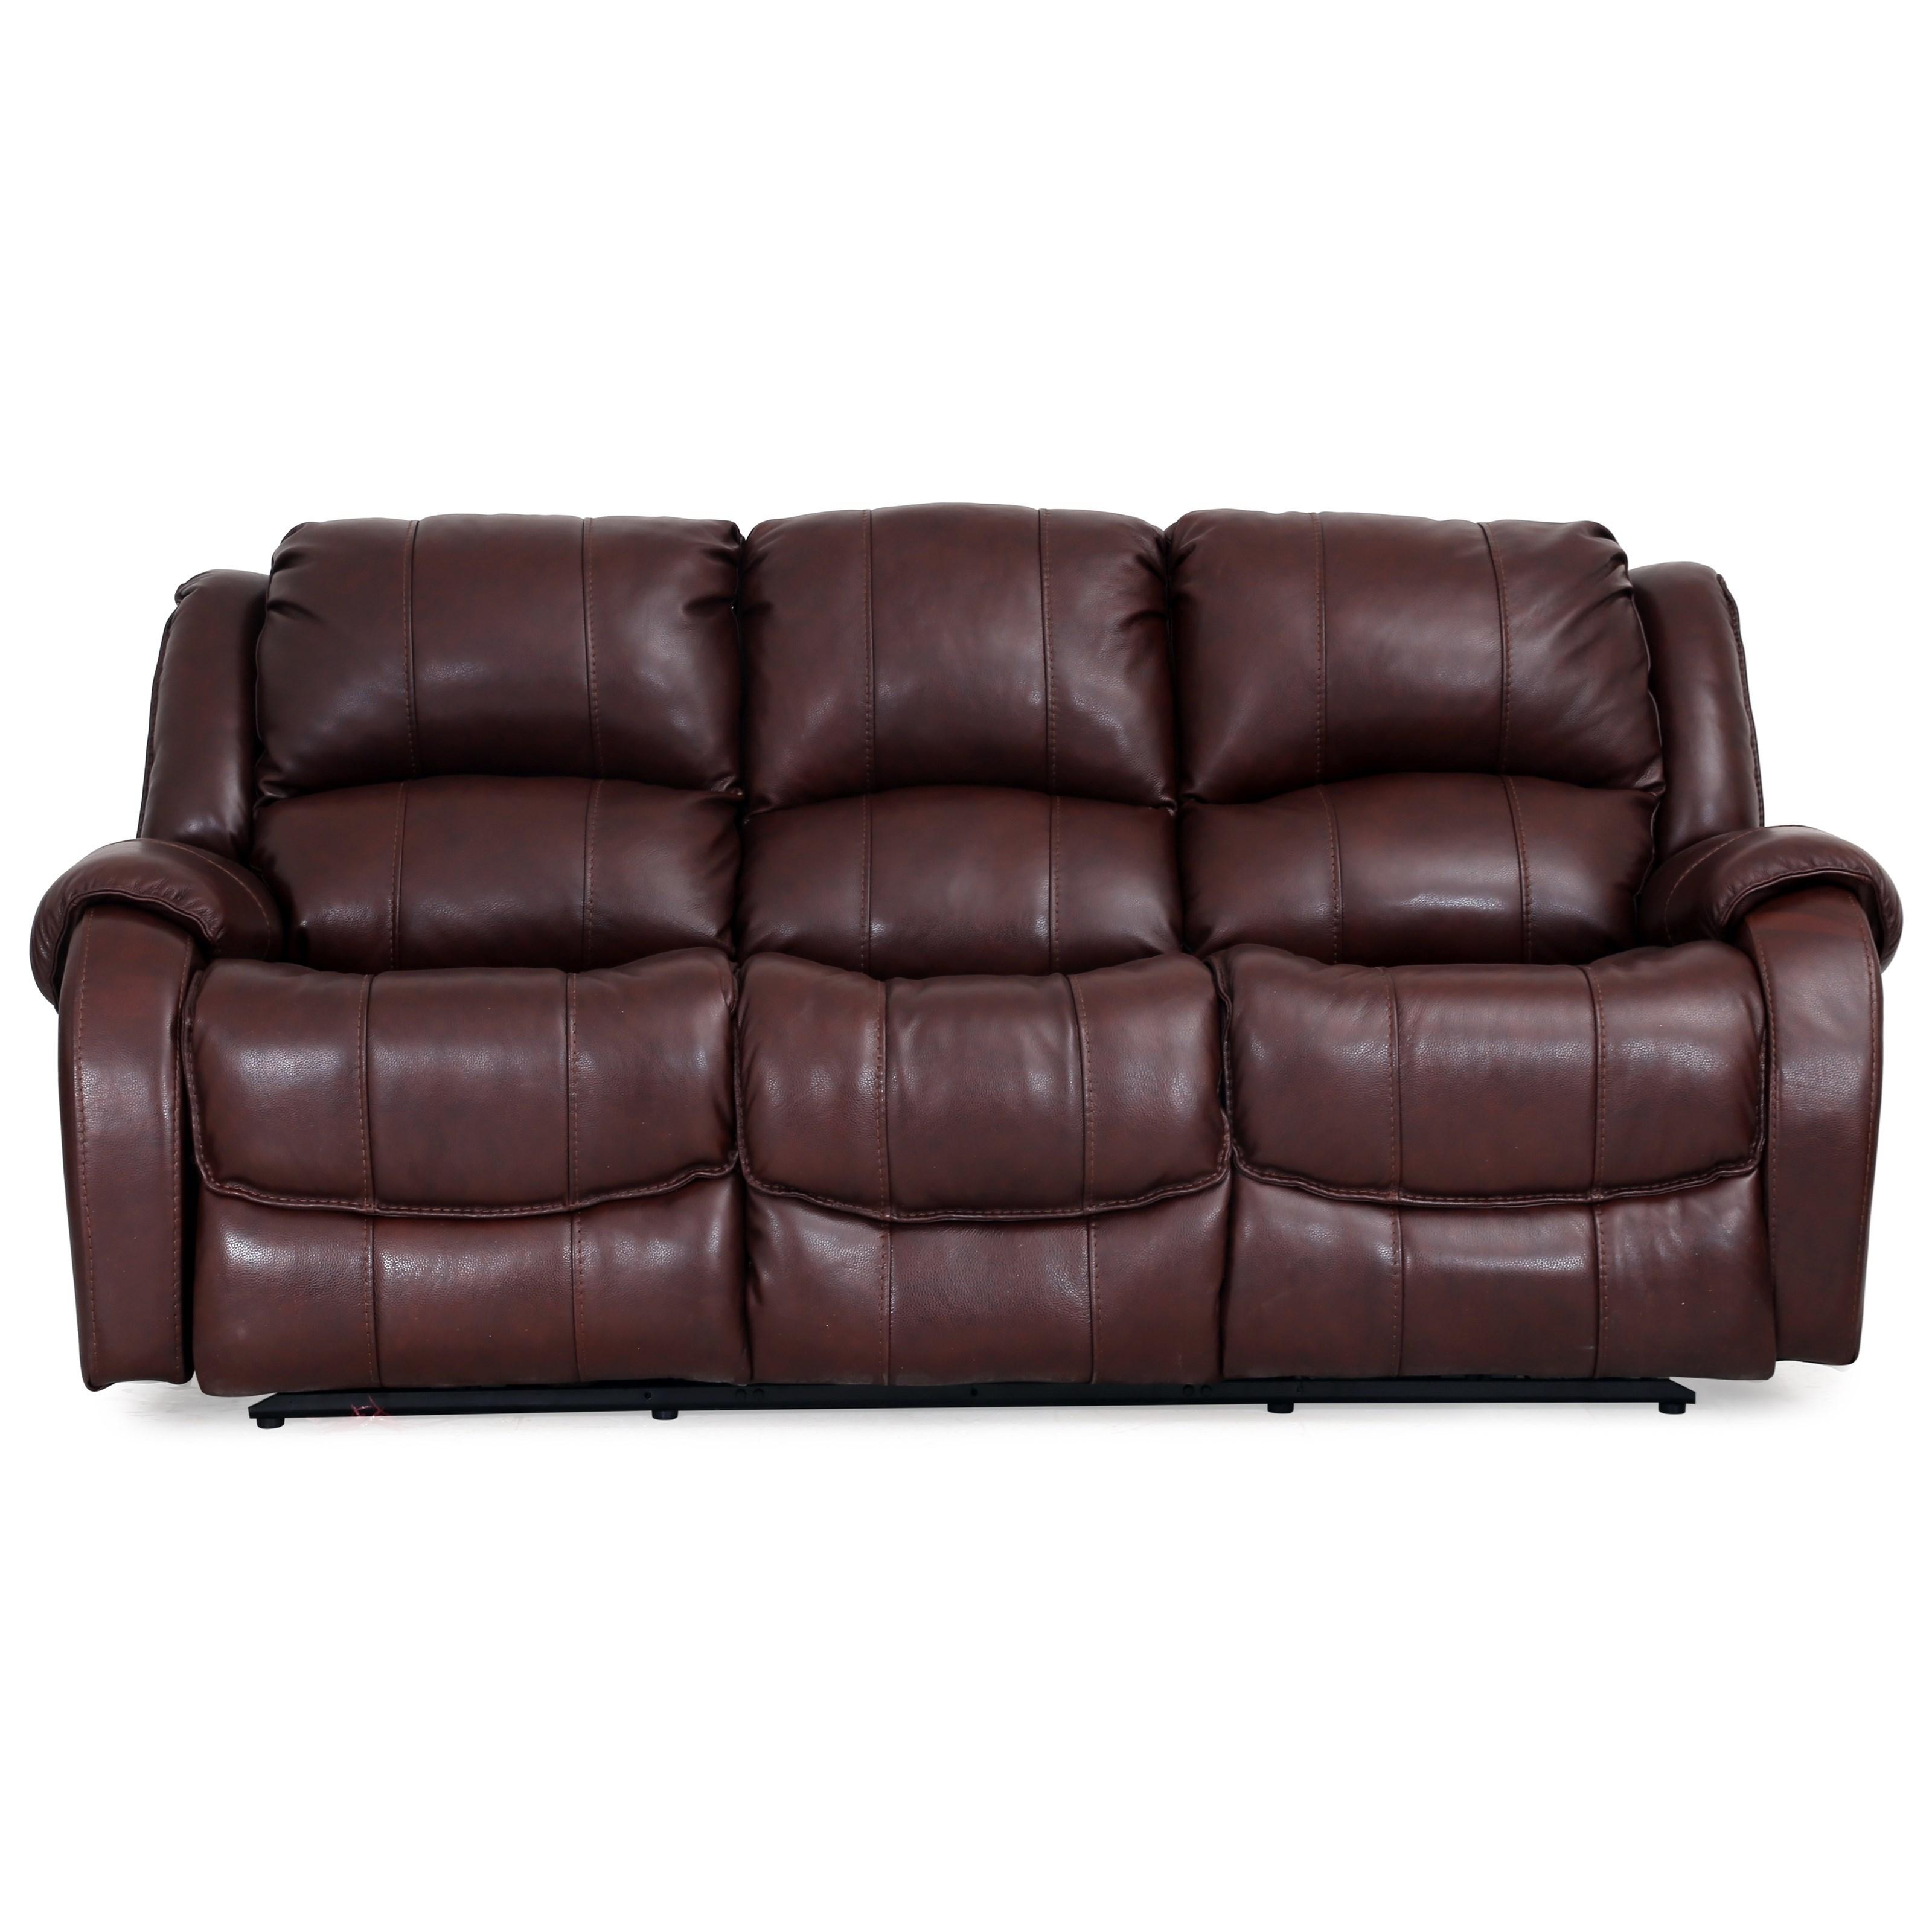 5171 Power Sofa with Power Headrest at Pilgrim Furniture City